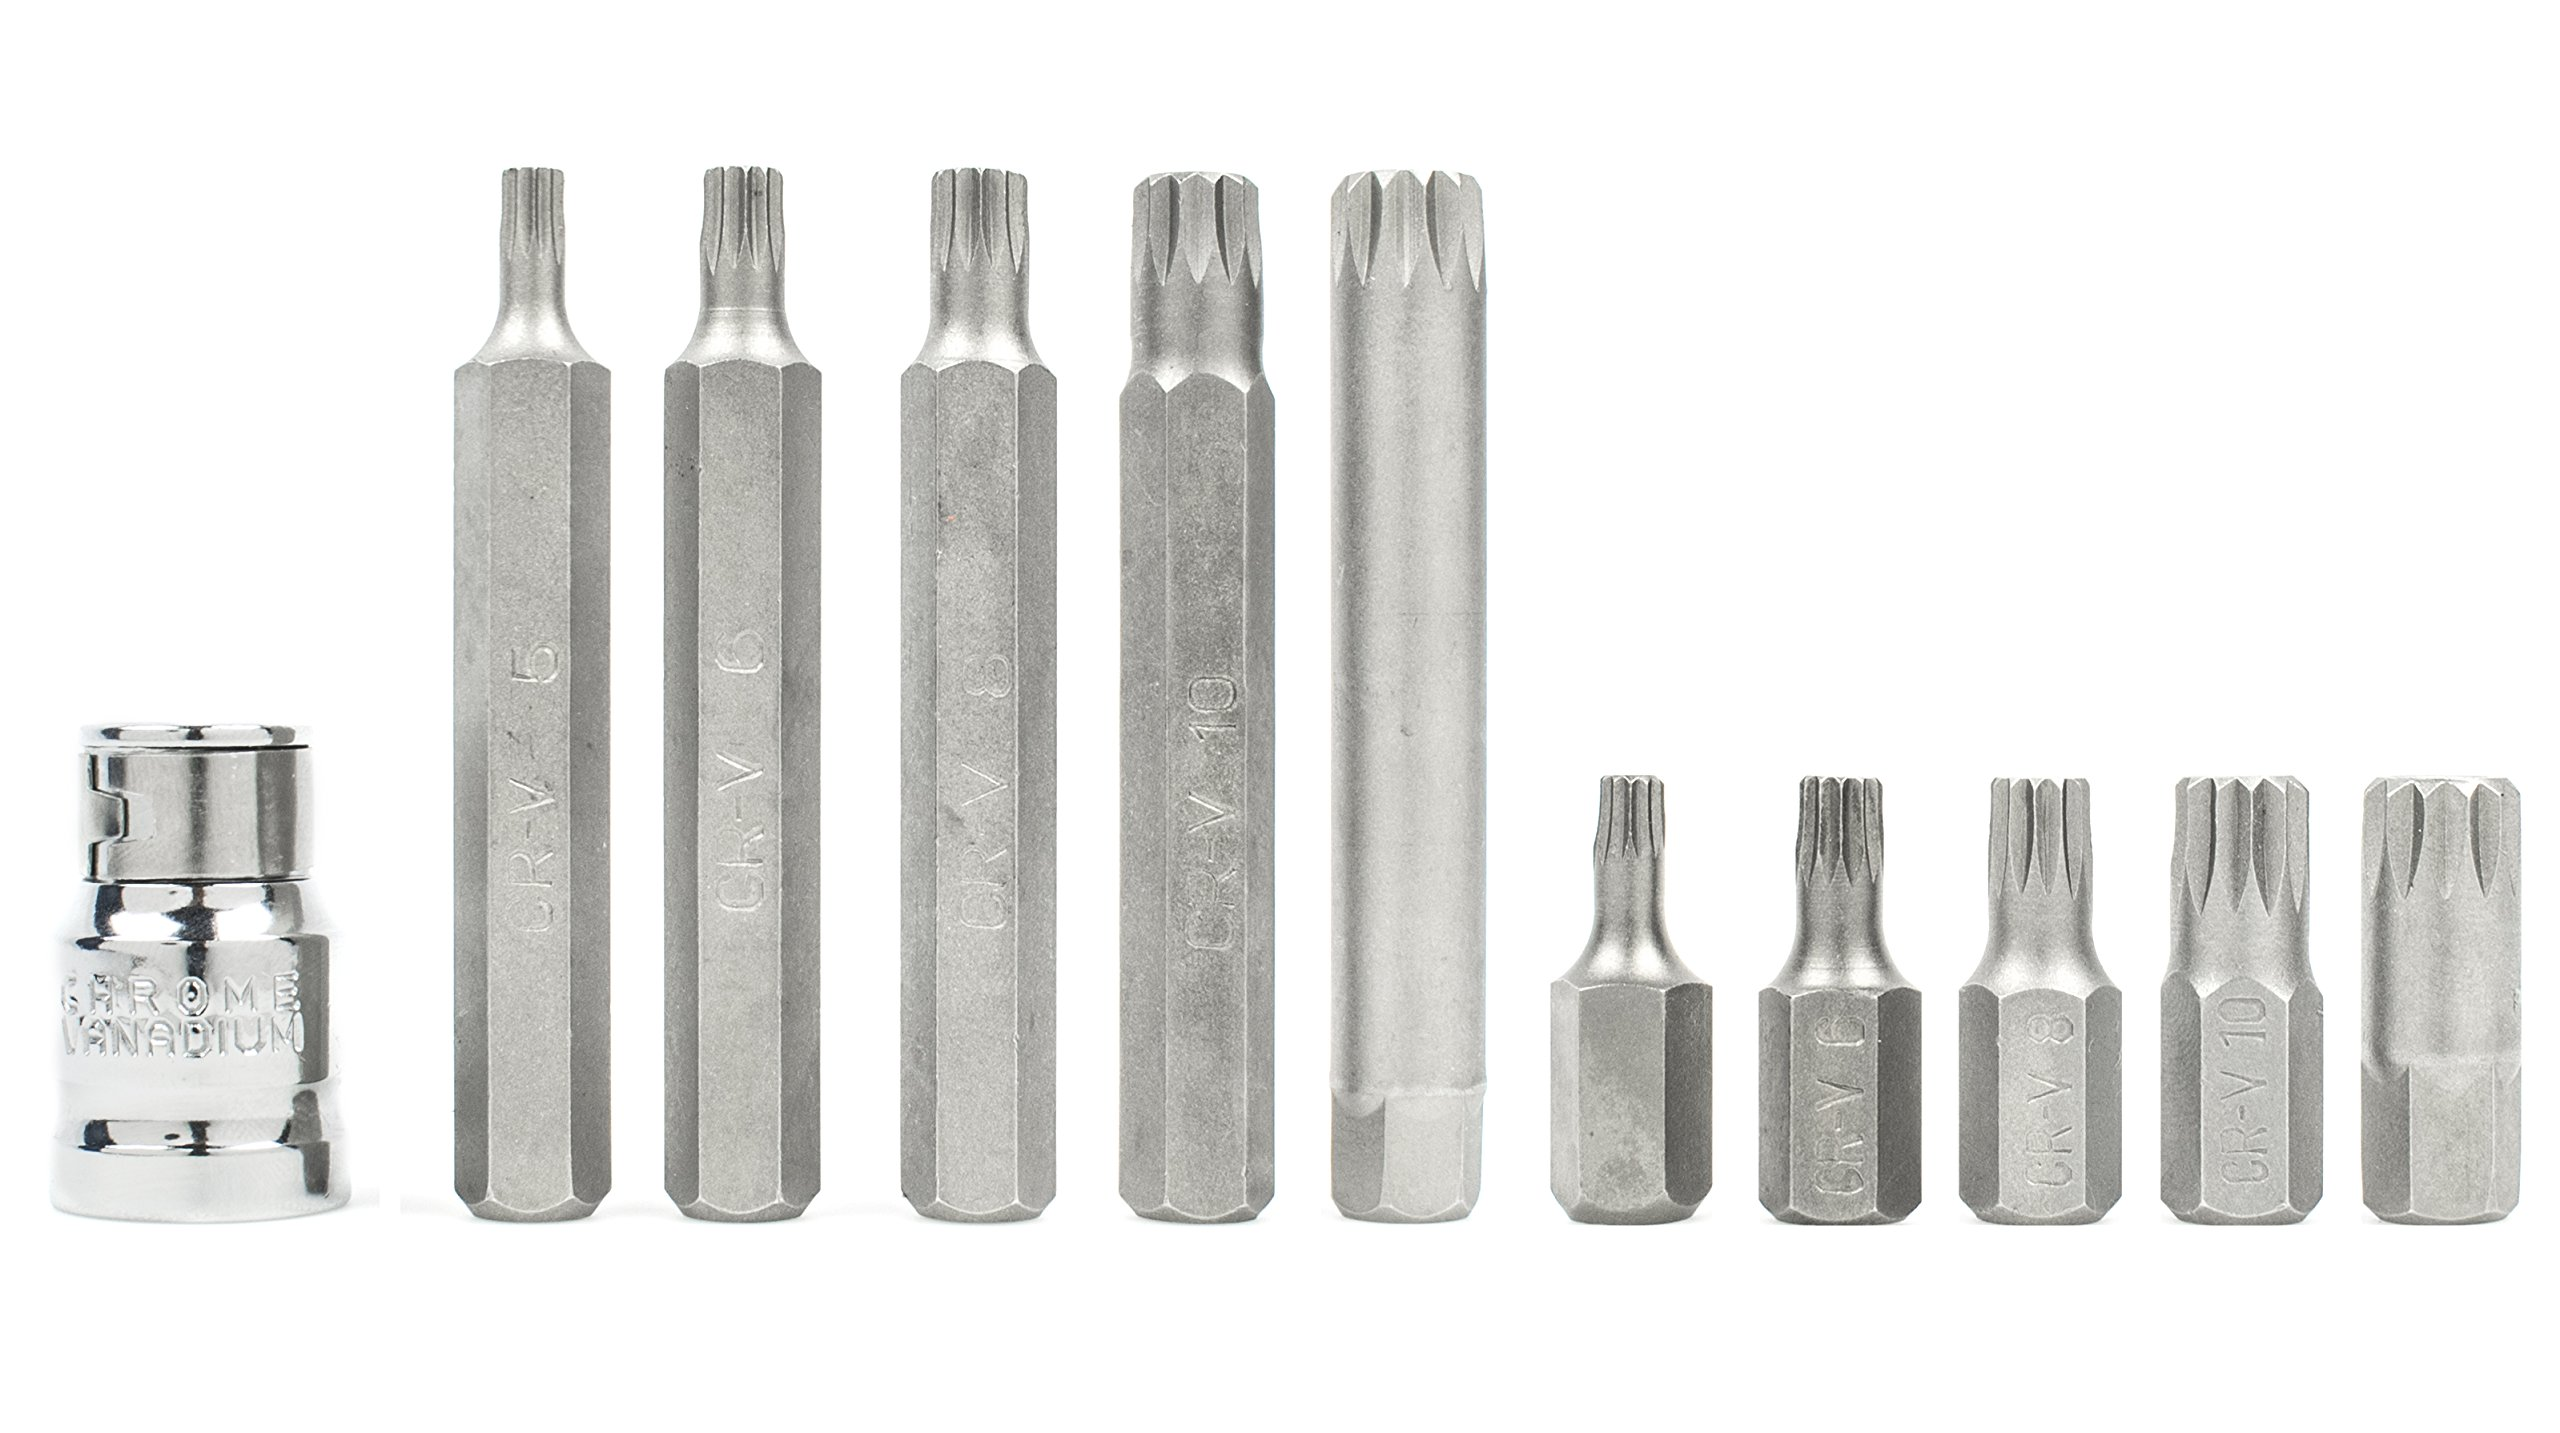 Bastex 11 piece Triple Square Socket Spline Bit 12 Point Set, CrV Steel by Bastex (Image #4)